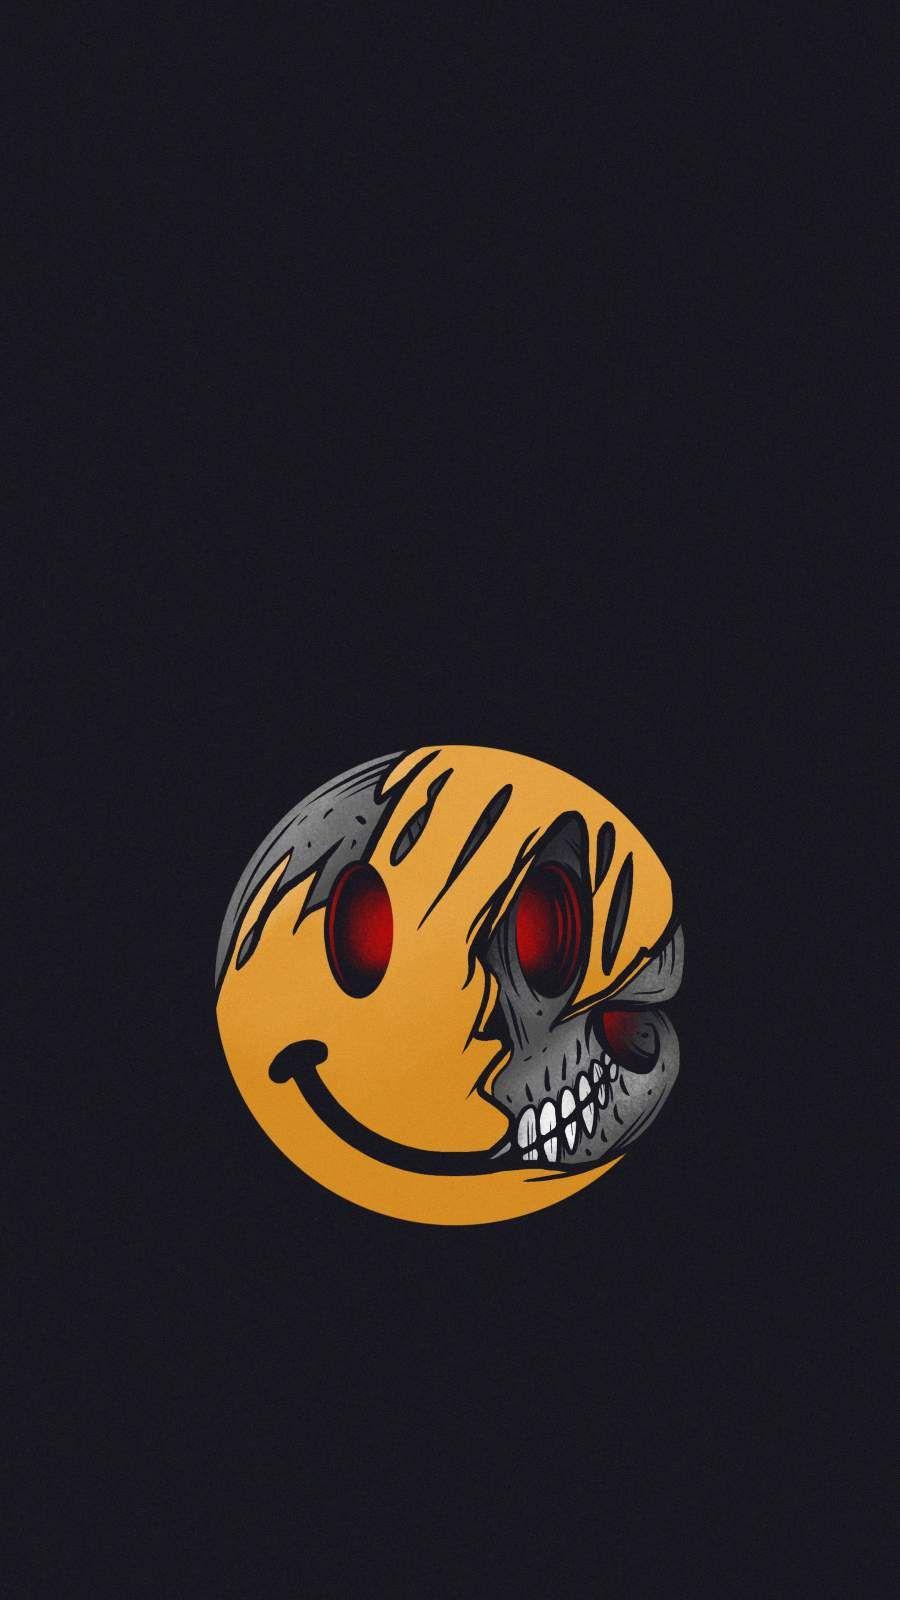 Dead Smiley iPhone Wallpaper - iPhone Wallpapers